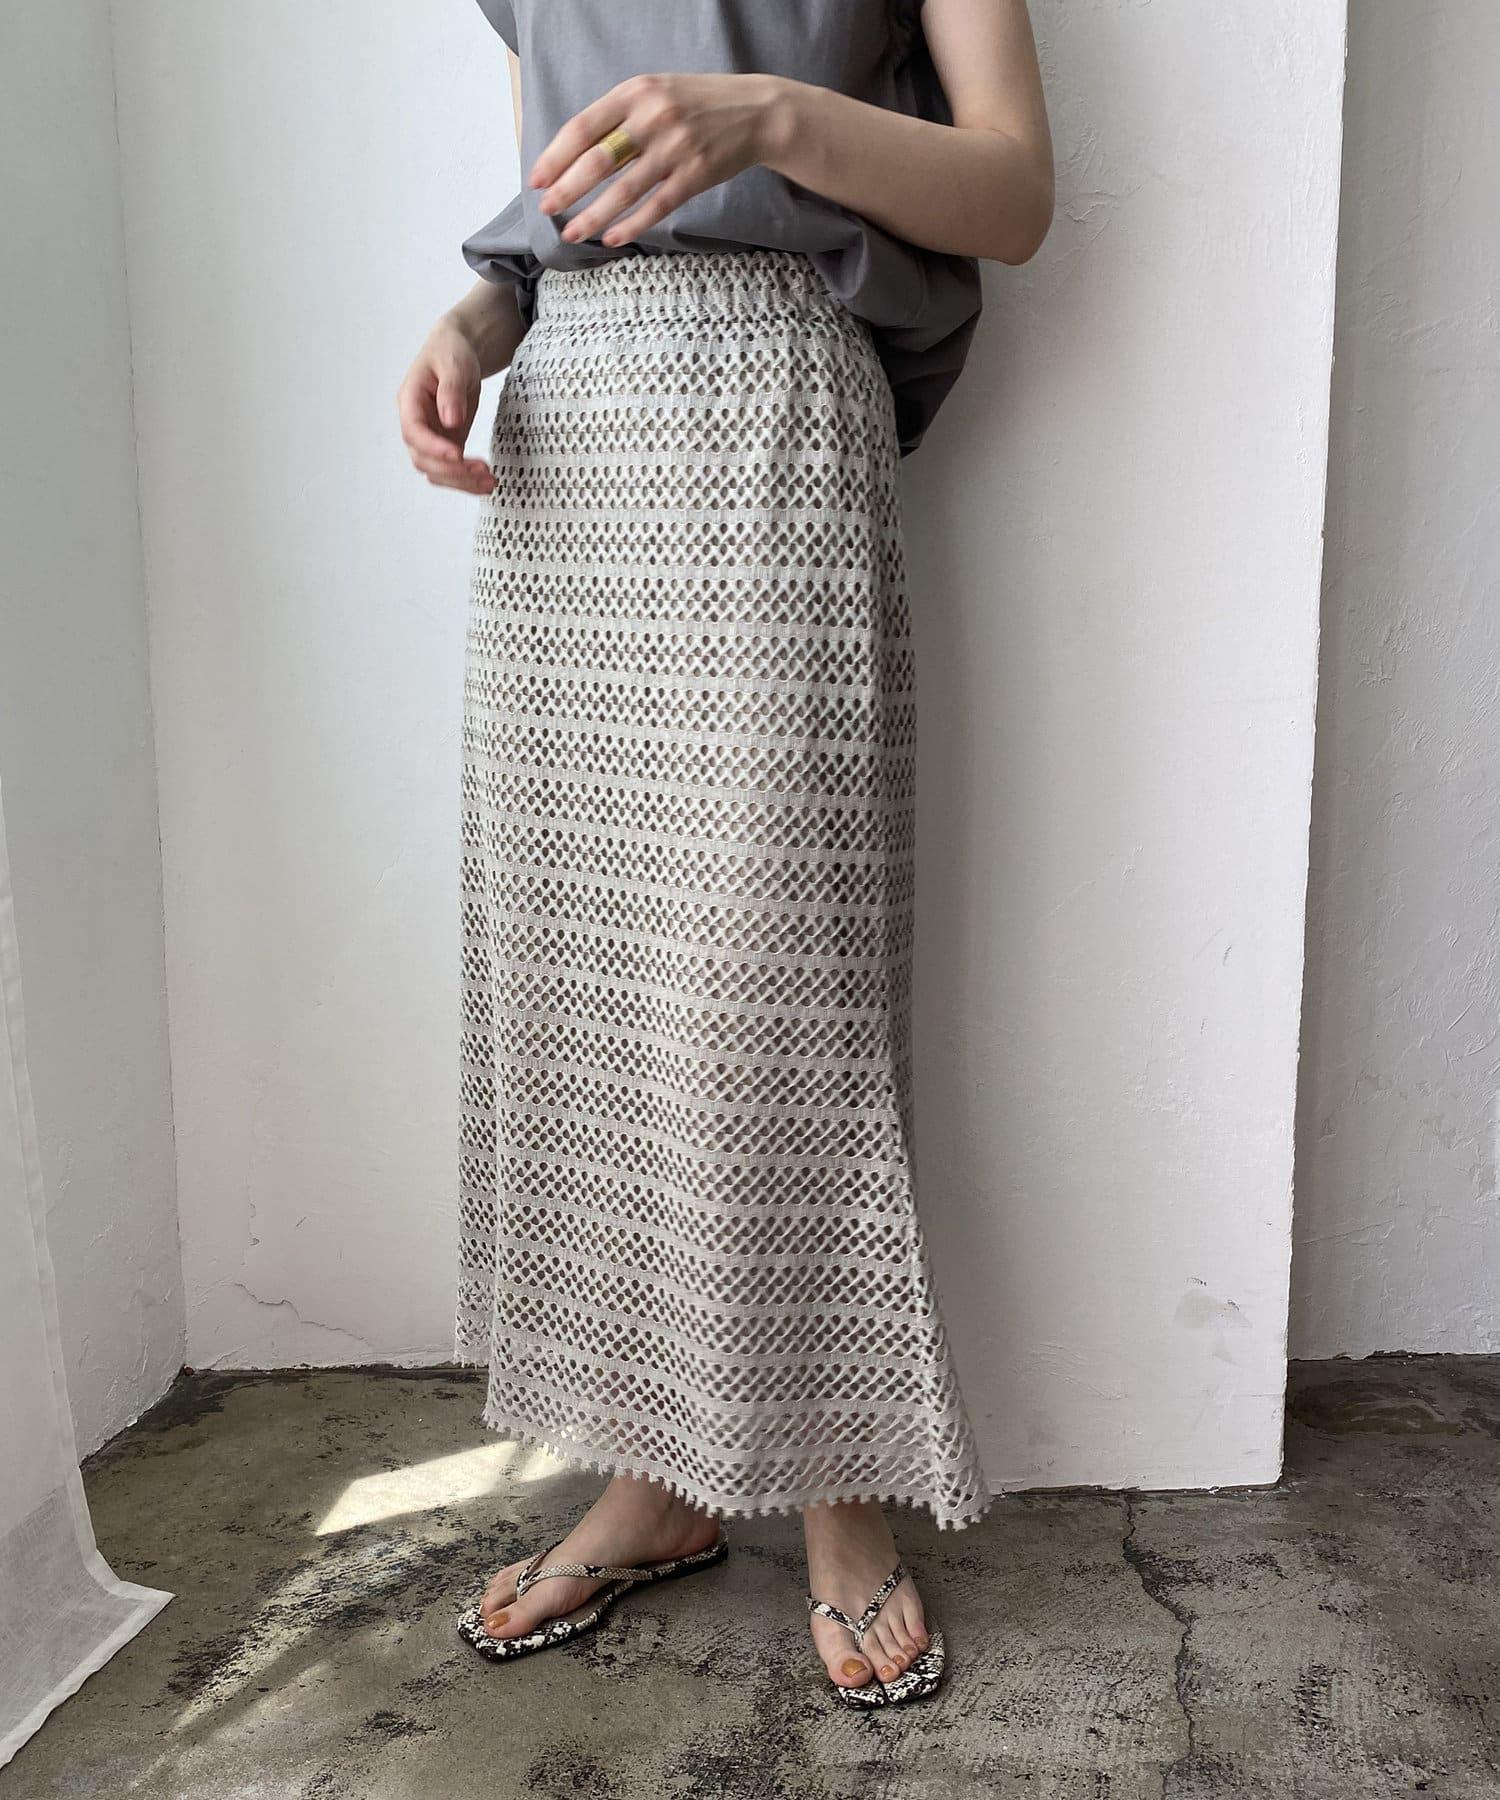 CAPRICIEUX LE'MAGE(カプリシュレマージュ) 2WAYクロシェレーススカート